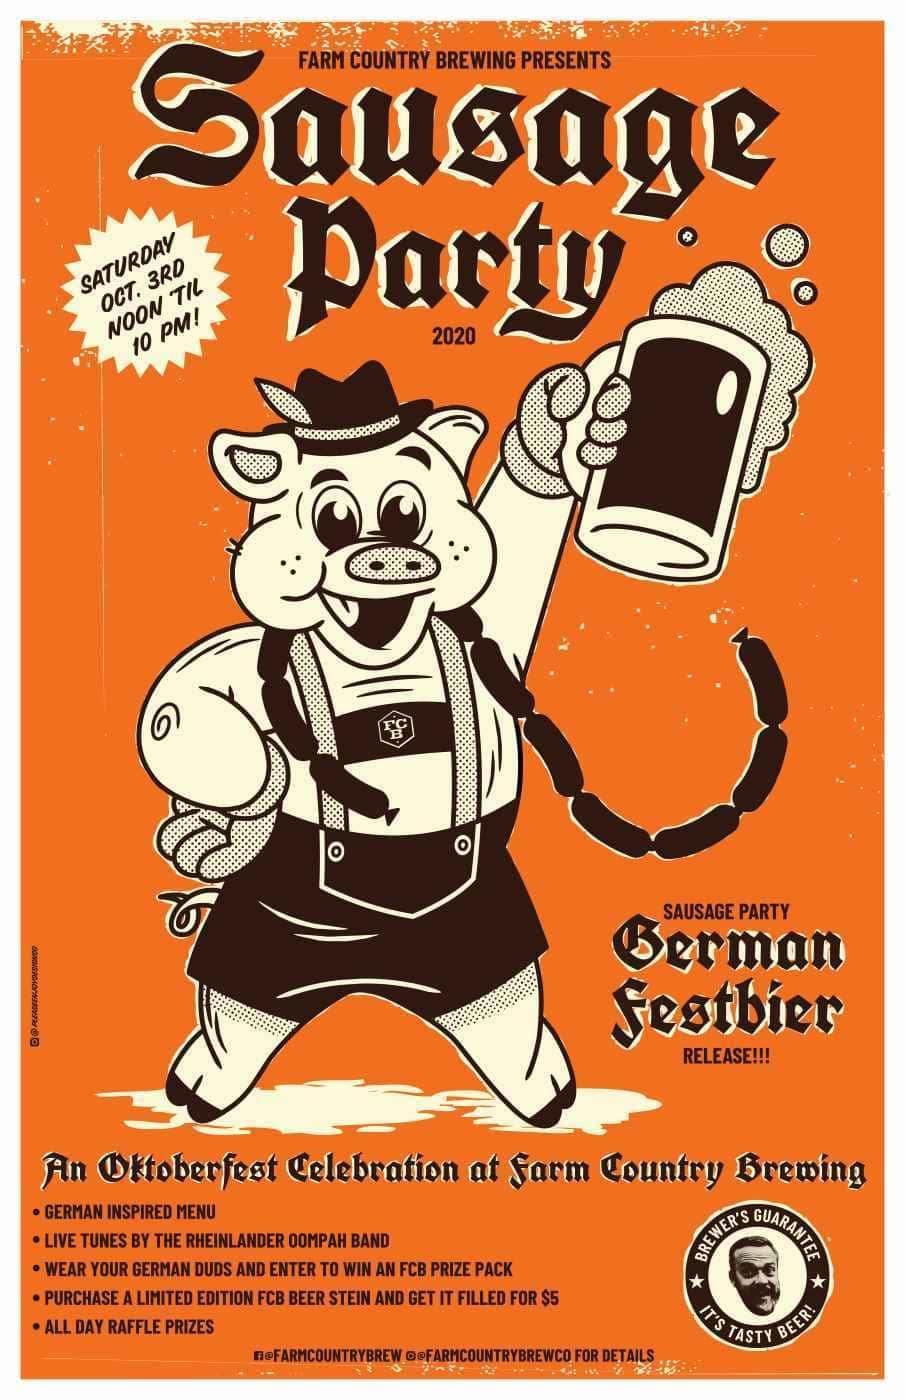 Poster for German Festbier